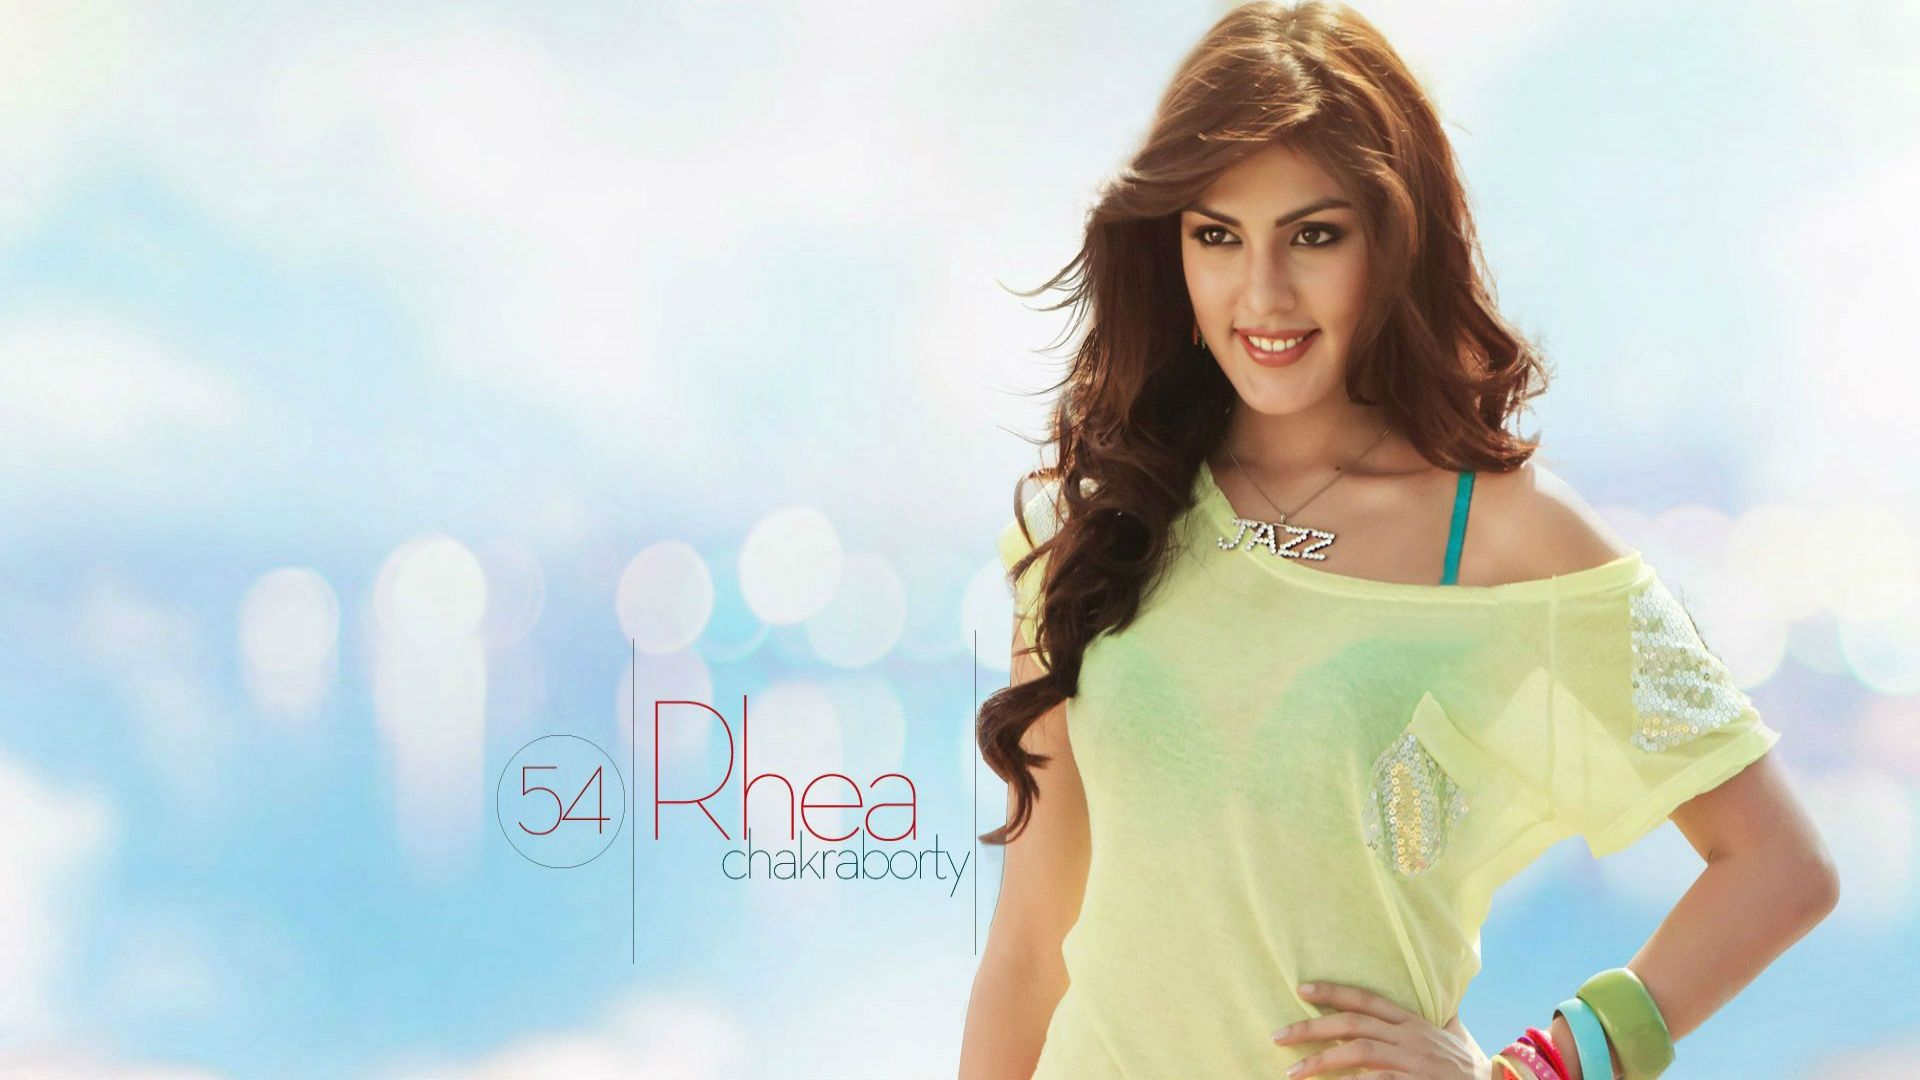 rhea chakraborty | models | pinterest | models